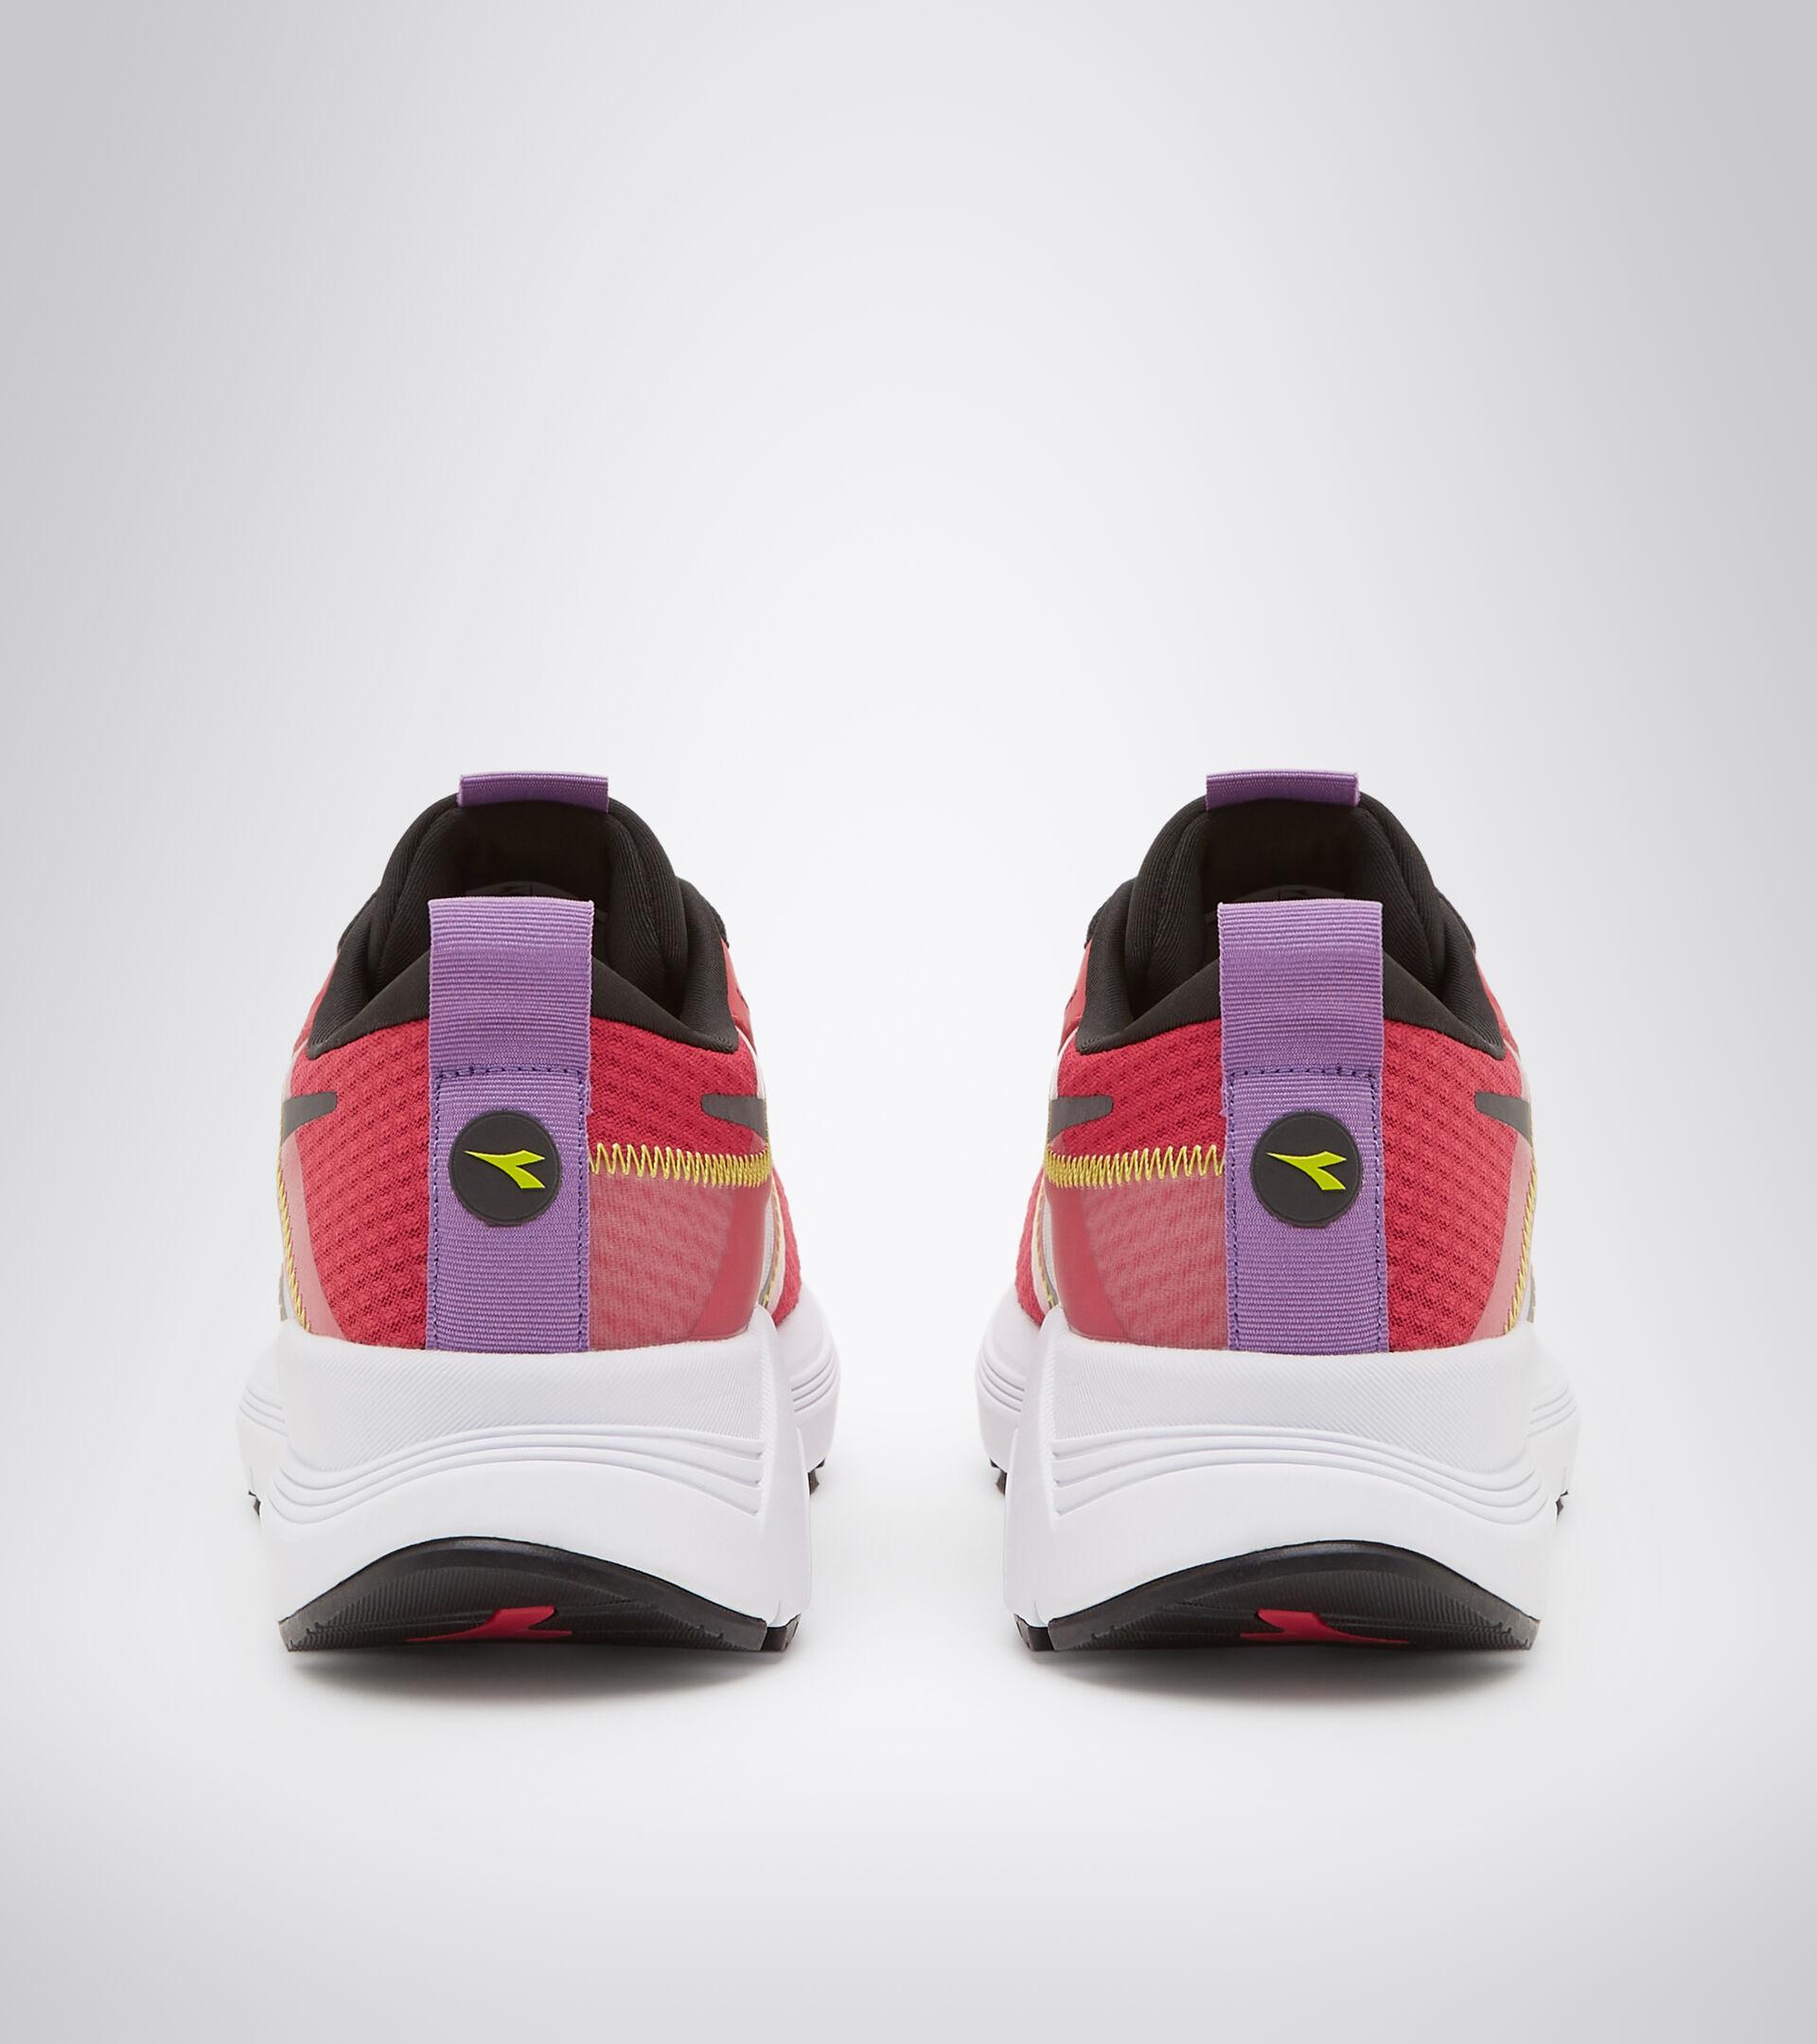 Footwear Sport DONNA MYTHOS BLUSHIELD ELITE TRX 2 W ROSA JAZZY/NERO/VLA CAMPANULA Diadora